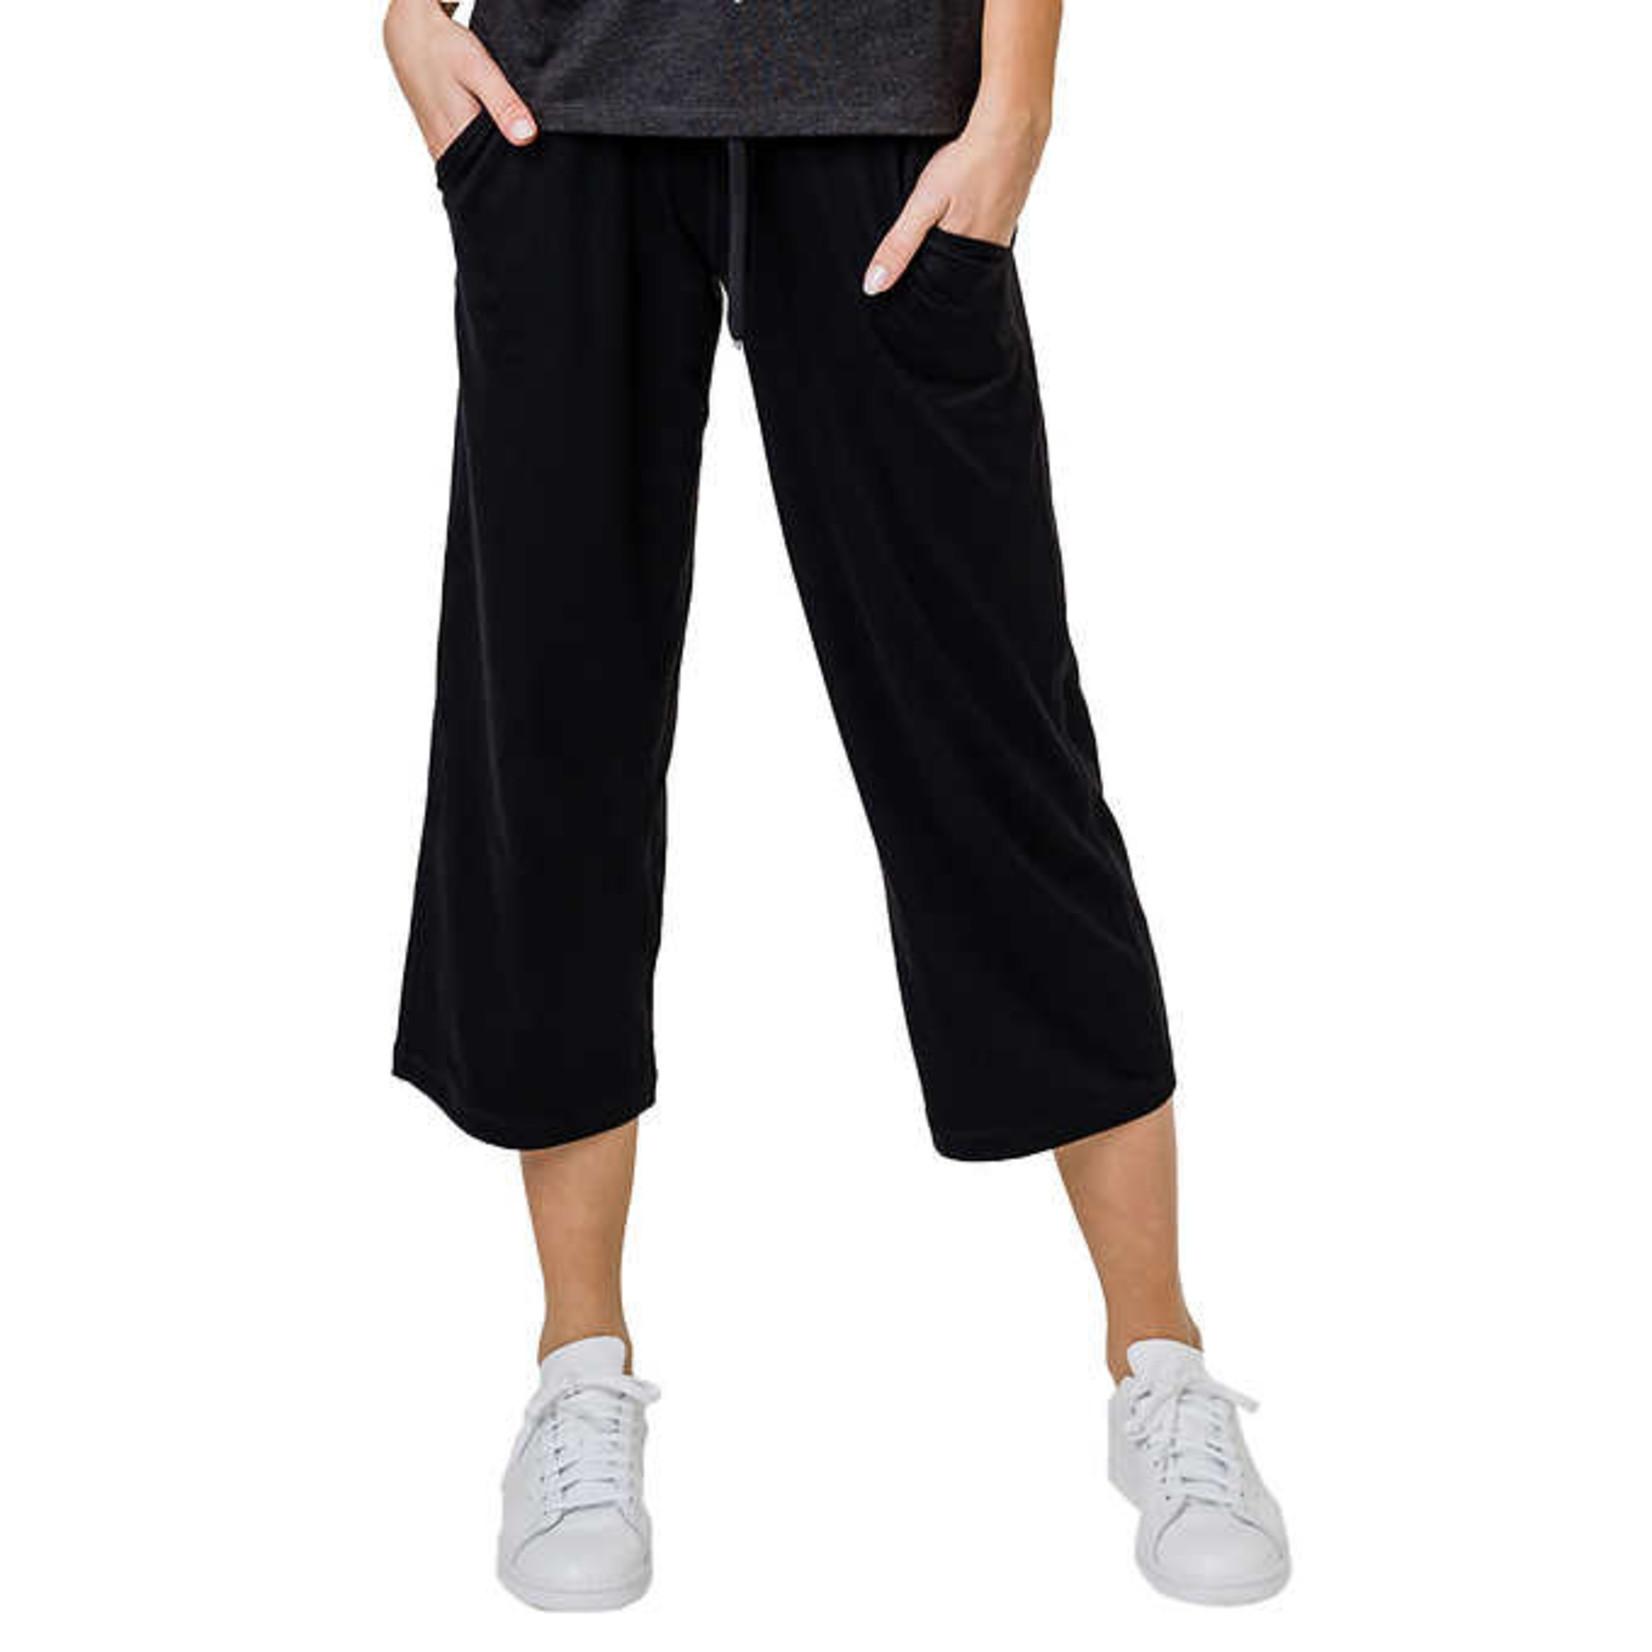 Tuff Athletics Ladies Gaucho Crop Pants-Black-S